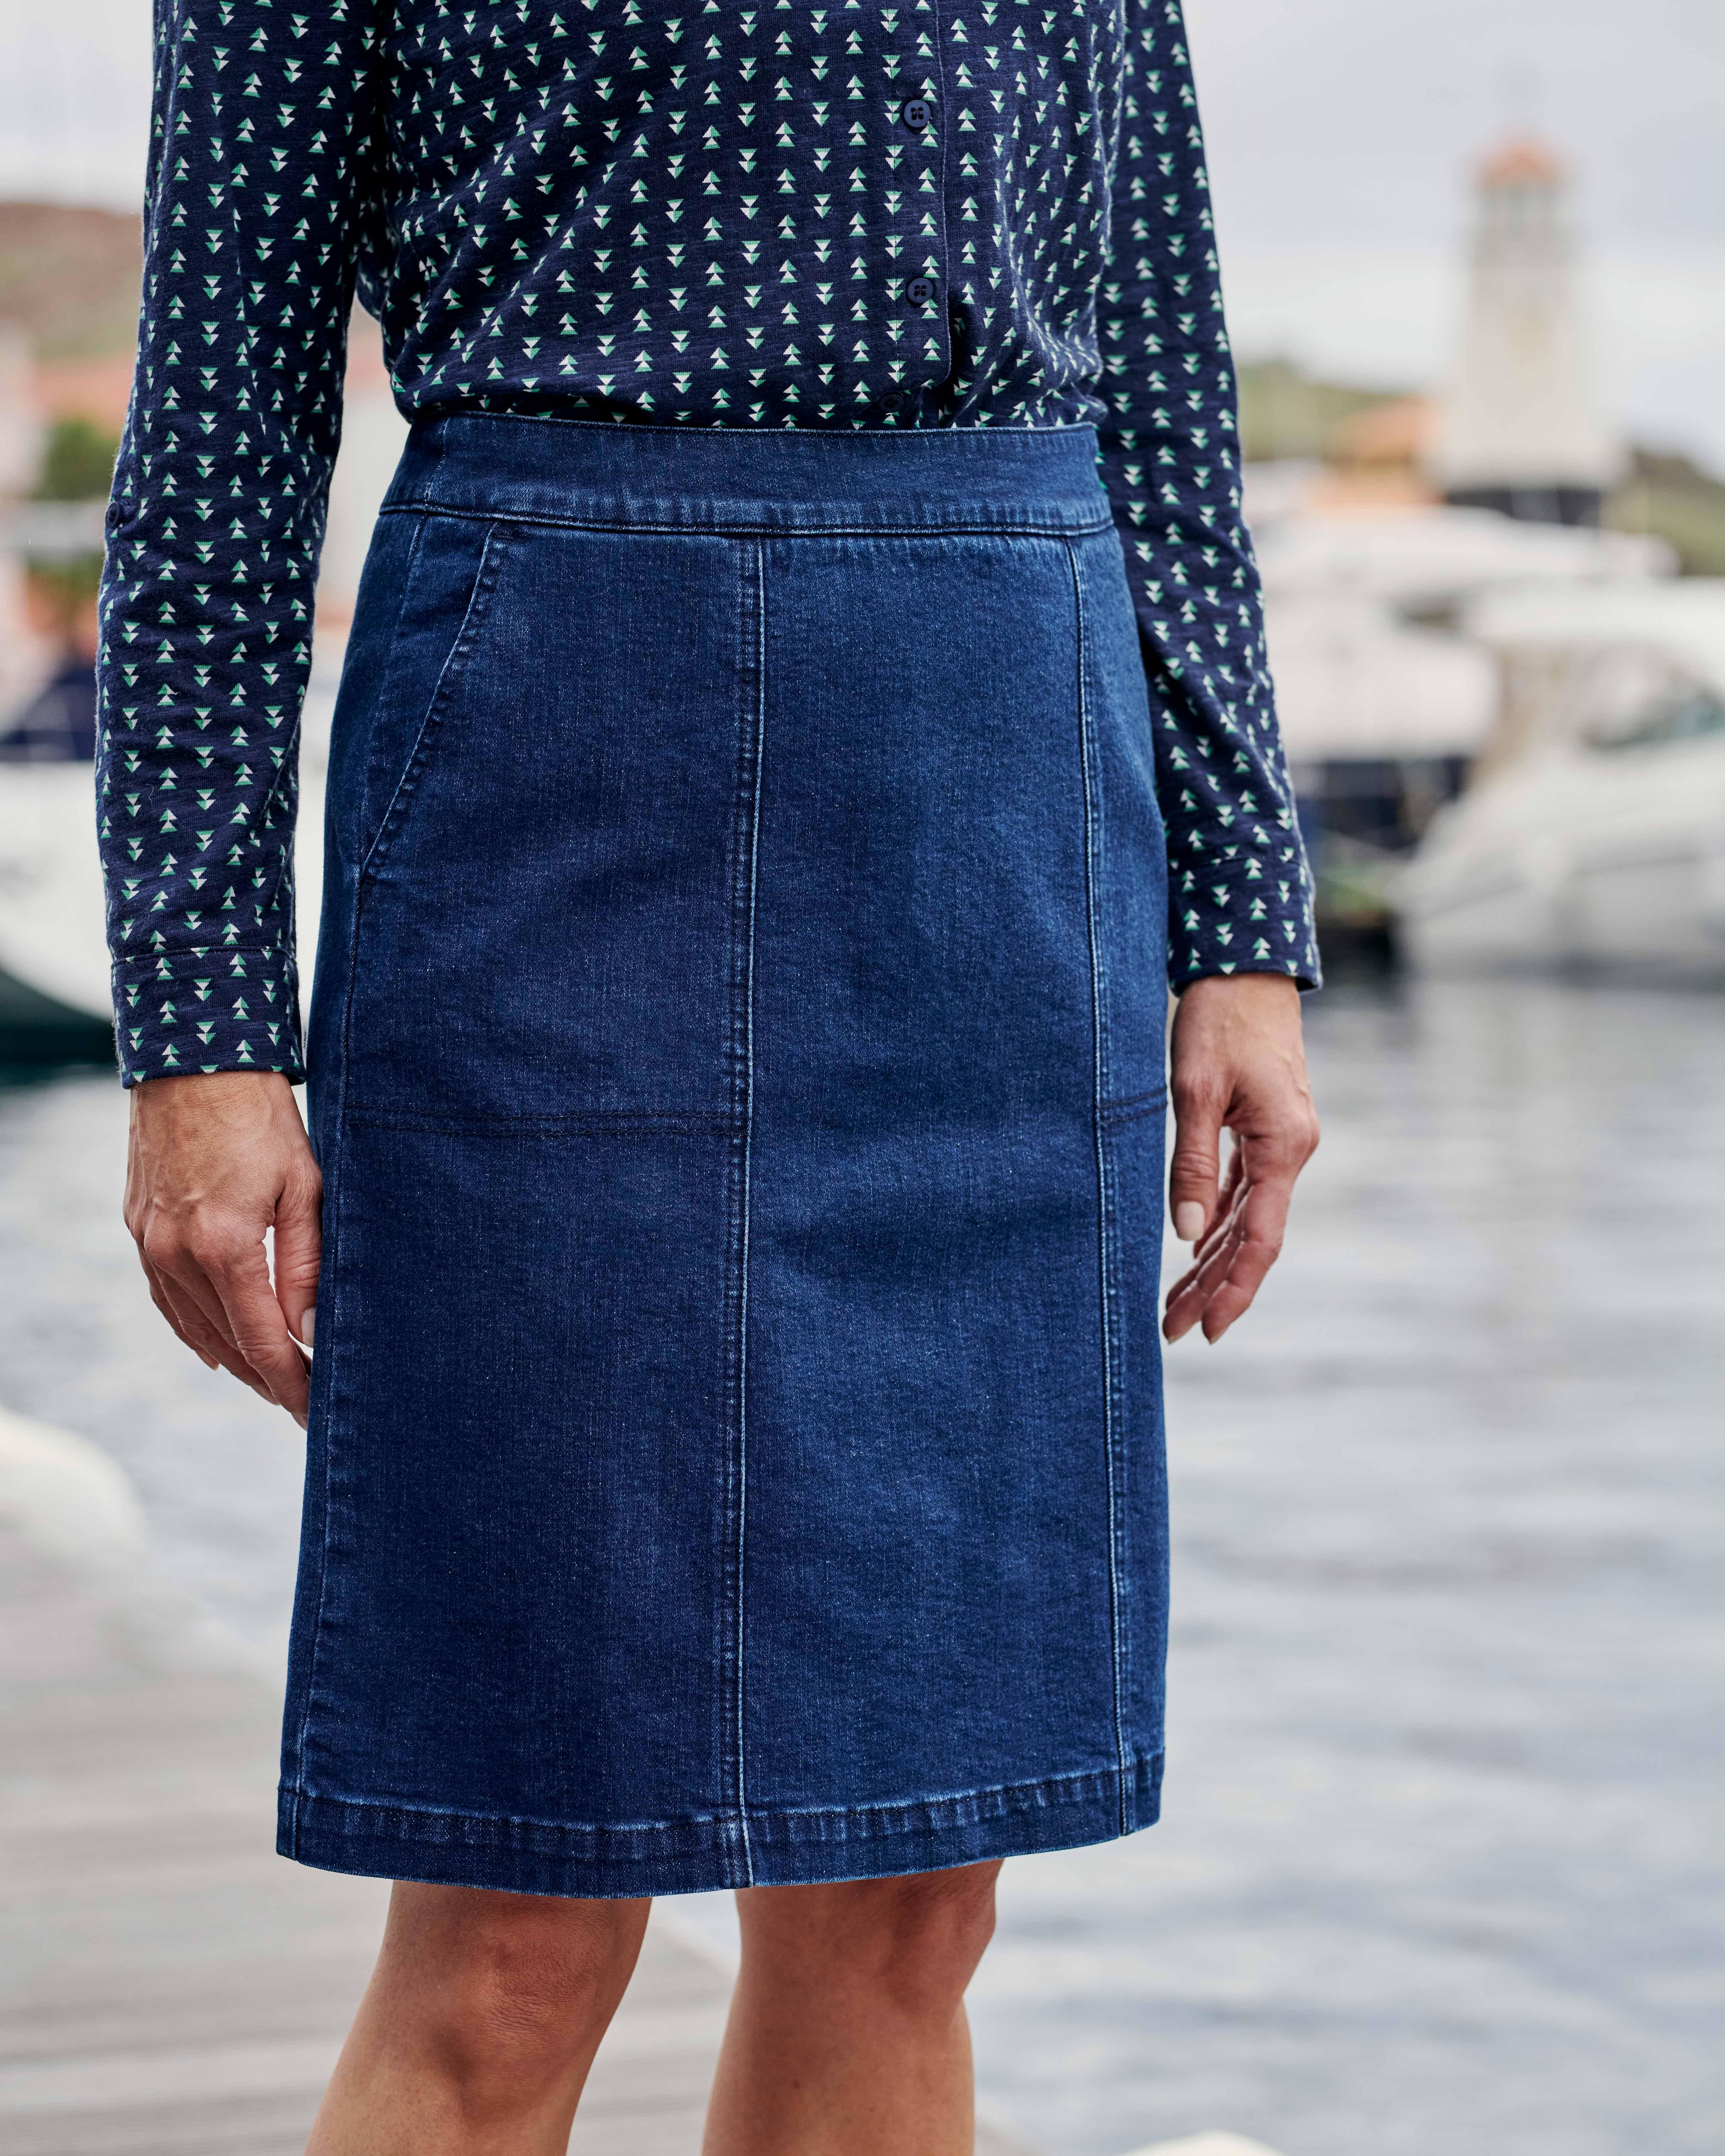 Cotton Denim Skirt